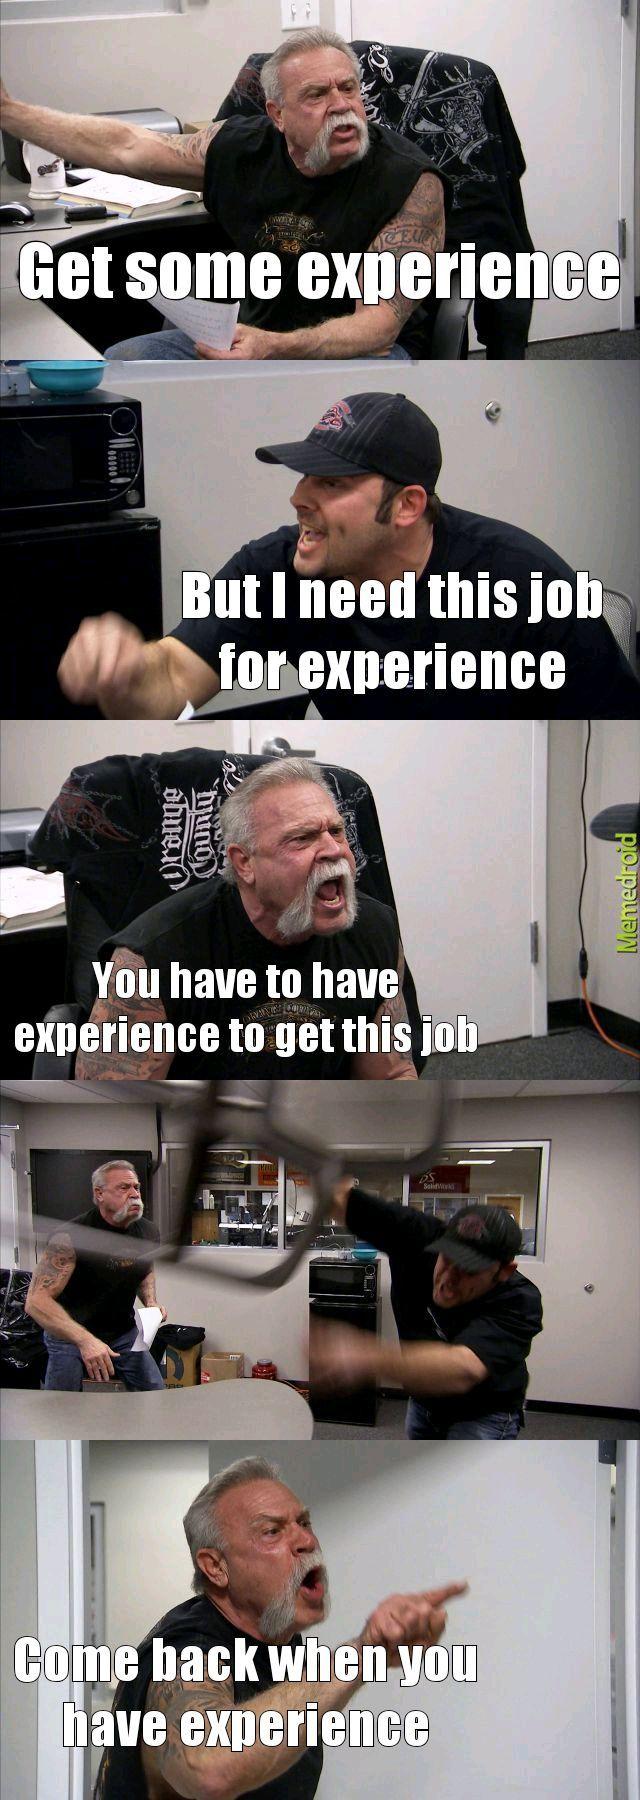 Jobs - meme